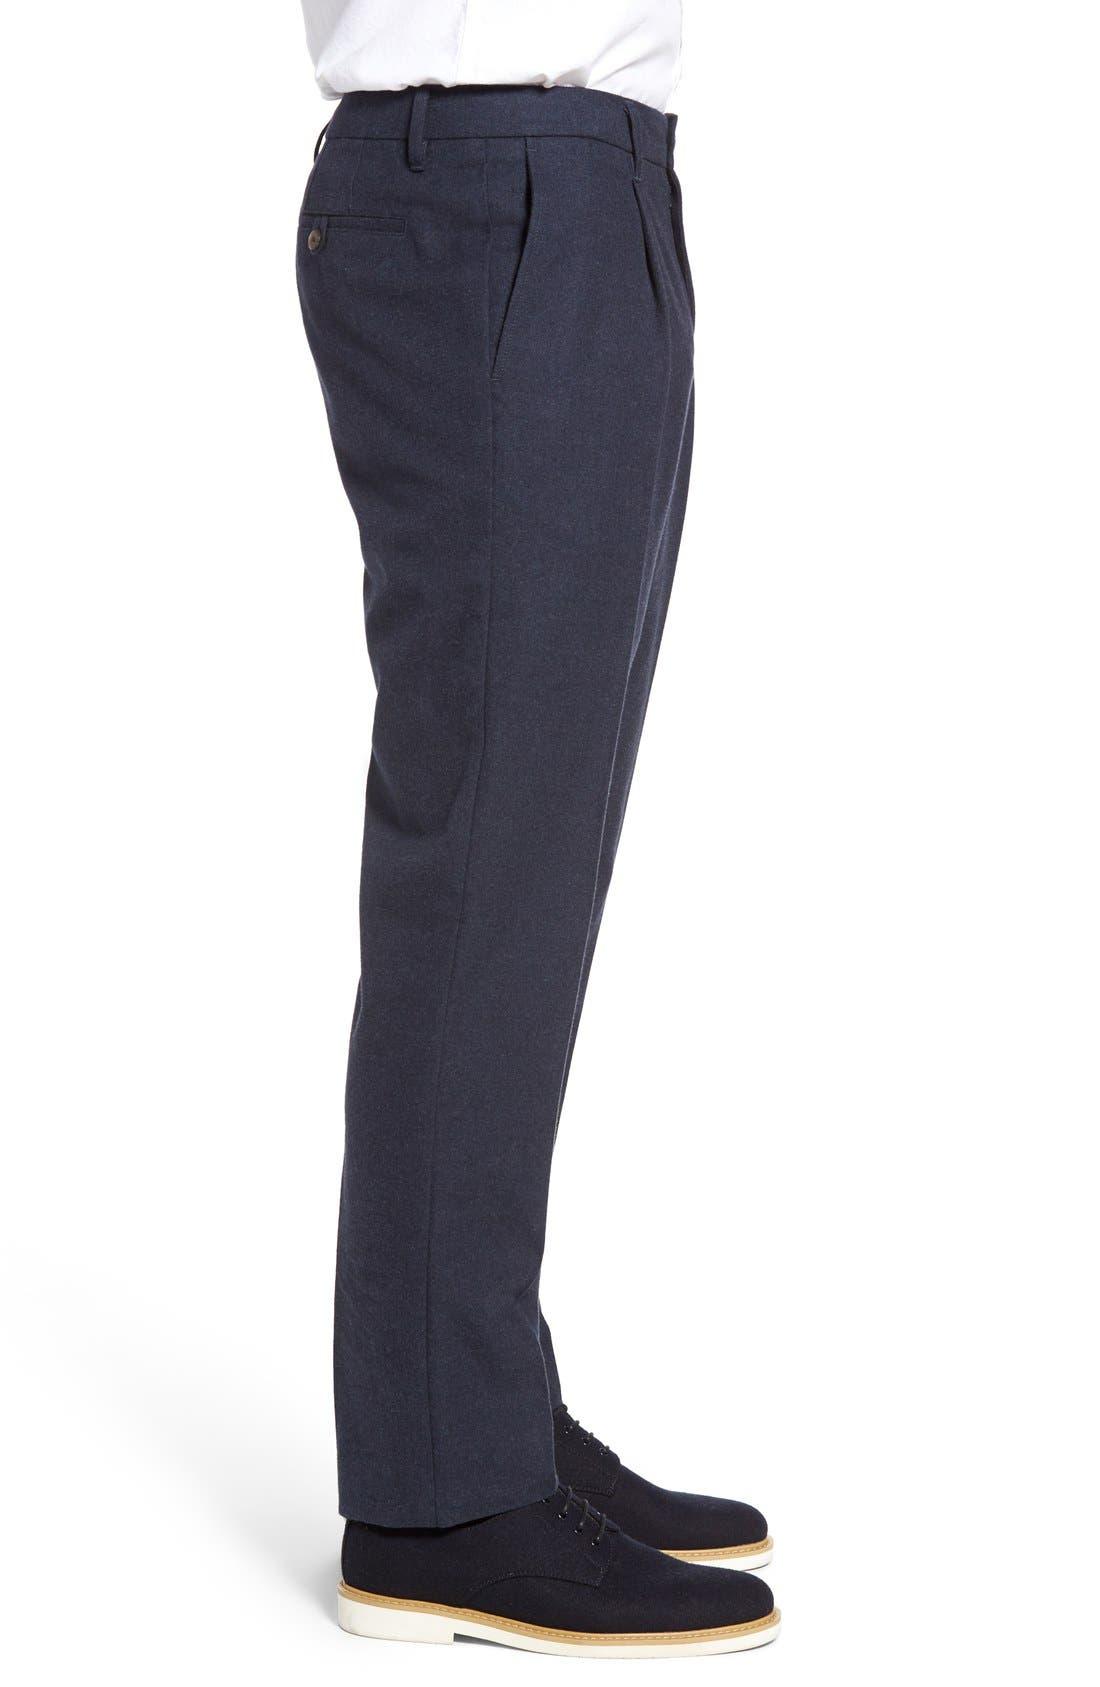 BONOBOS,                             Slim Fit Flannel Trousers,                             Alternate thumbnail 8, color,                             400